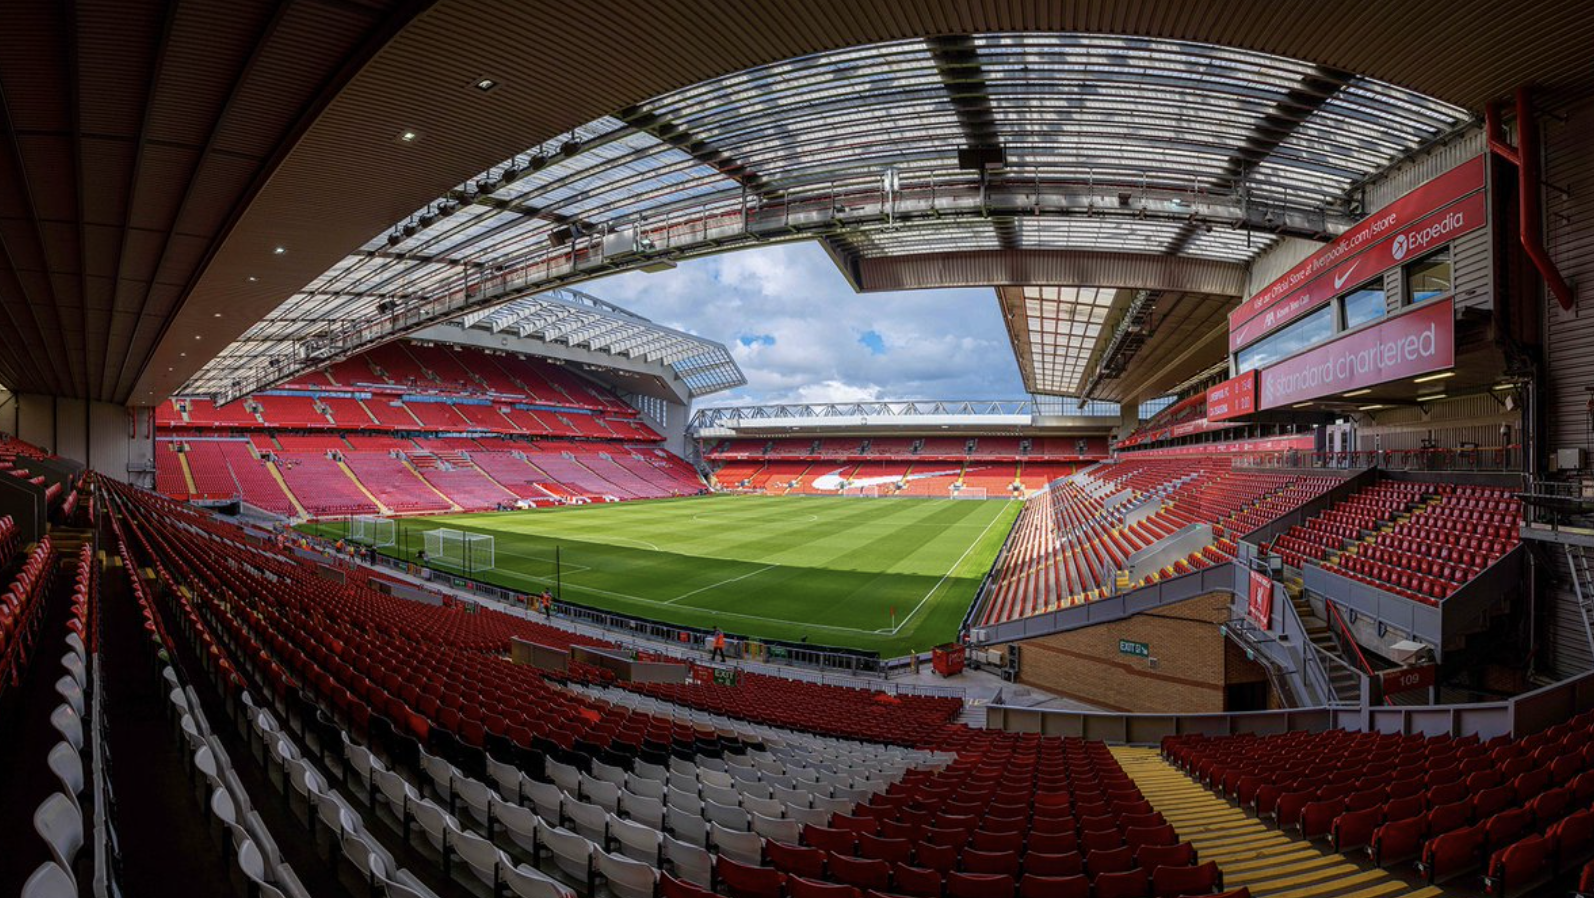 Premier League Sponsorship Assets that Drove the Highest Brand Visibility on Social Media